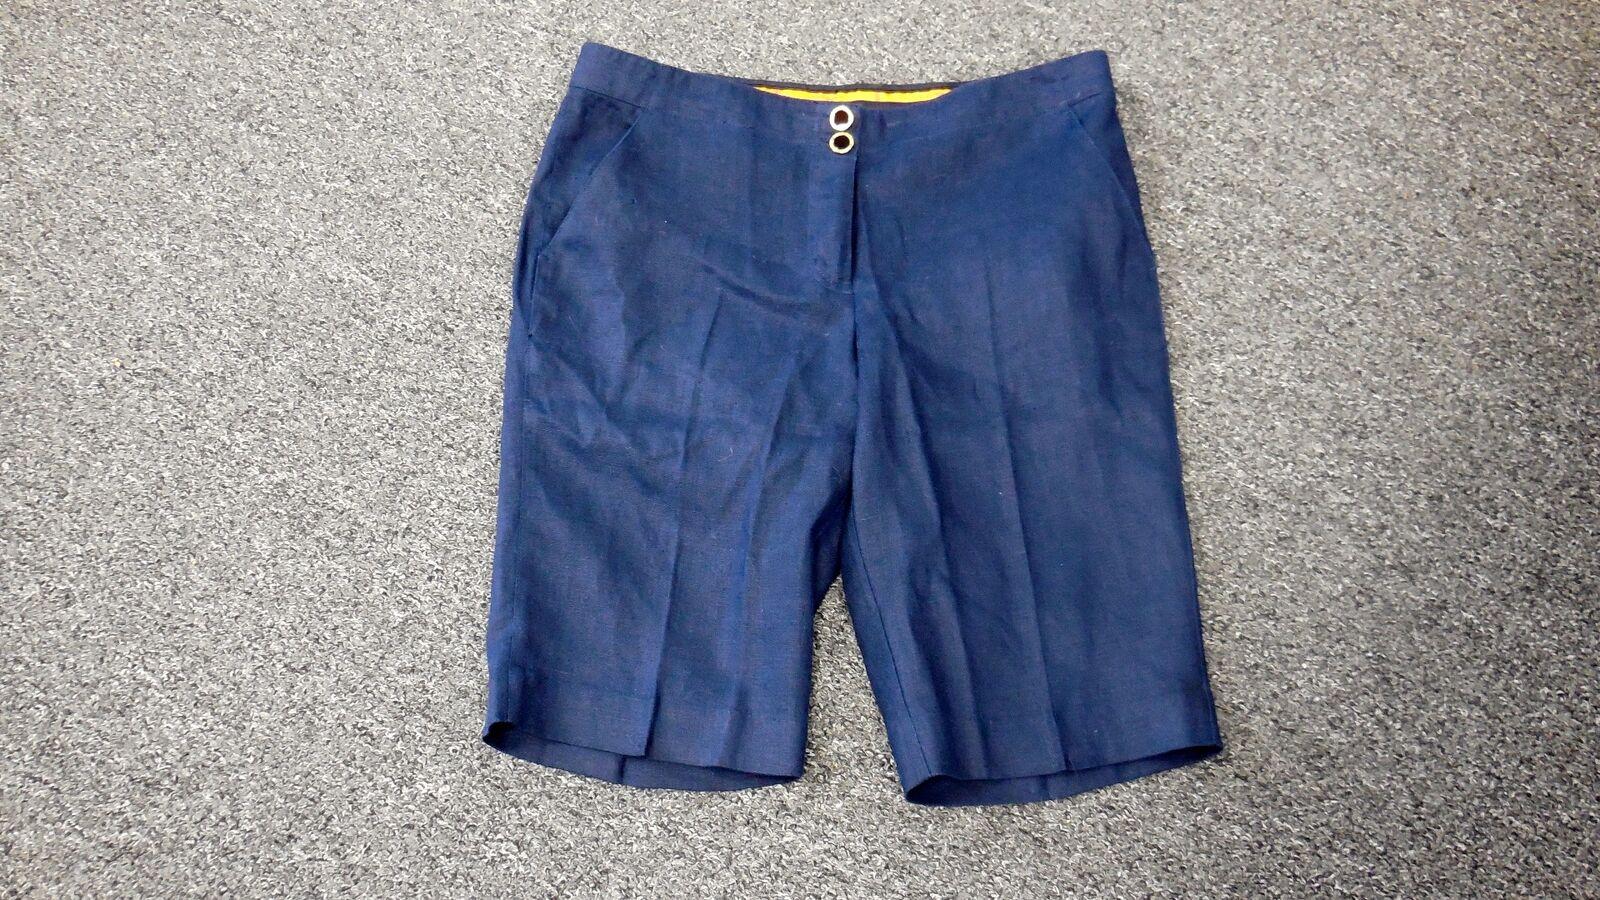 TORY BURCH Navy bluee Linen Flat Zip Front Solid Bermuda Shorts Sz 10 FF4307